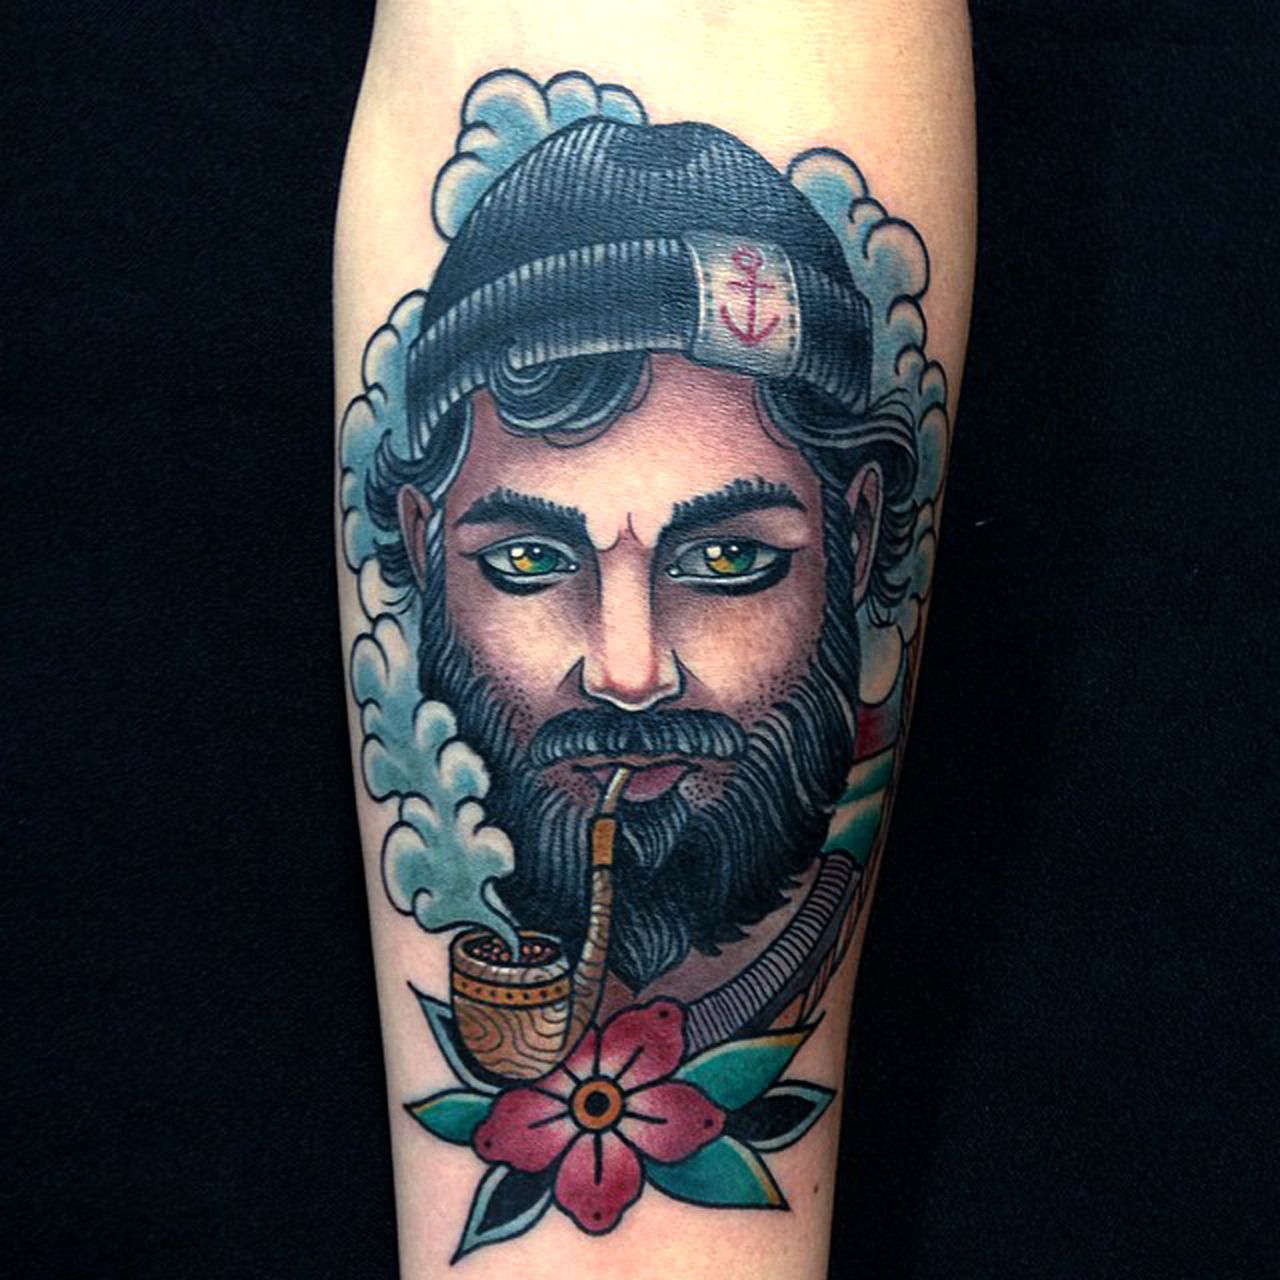 Pin De Andrew Mougios En Tattoos: Pin De Mauricio Mercado Contreras En Tattoos